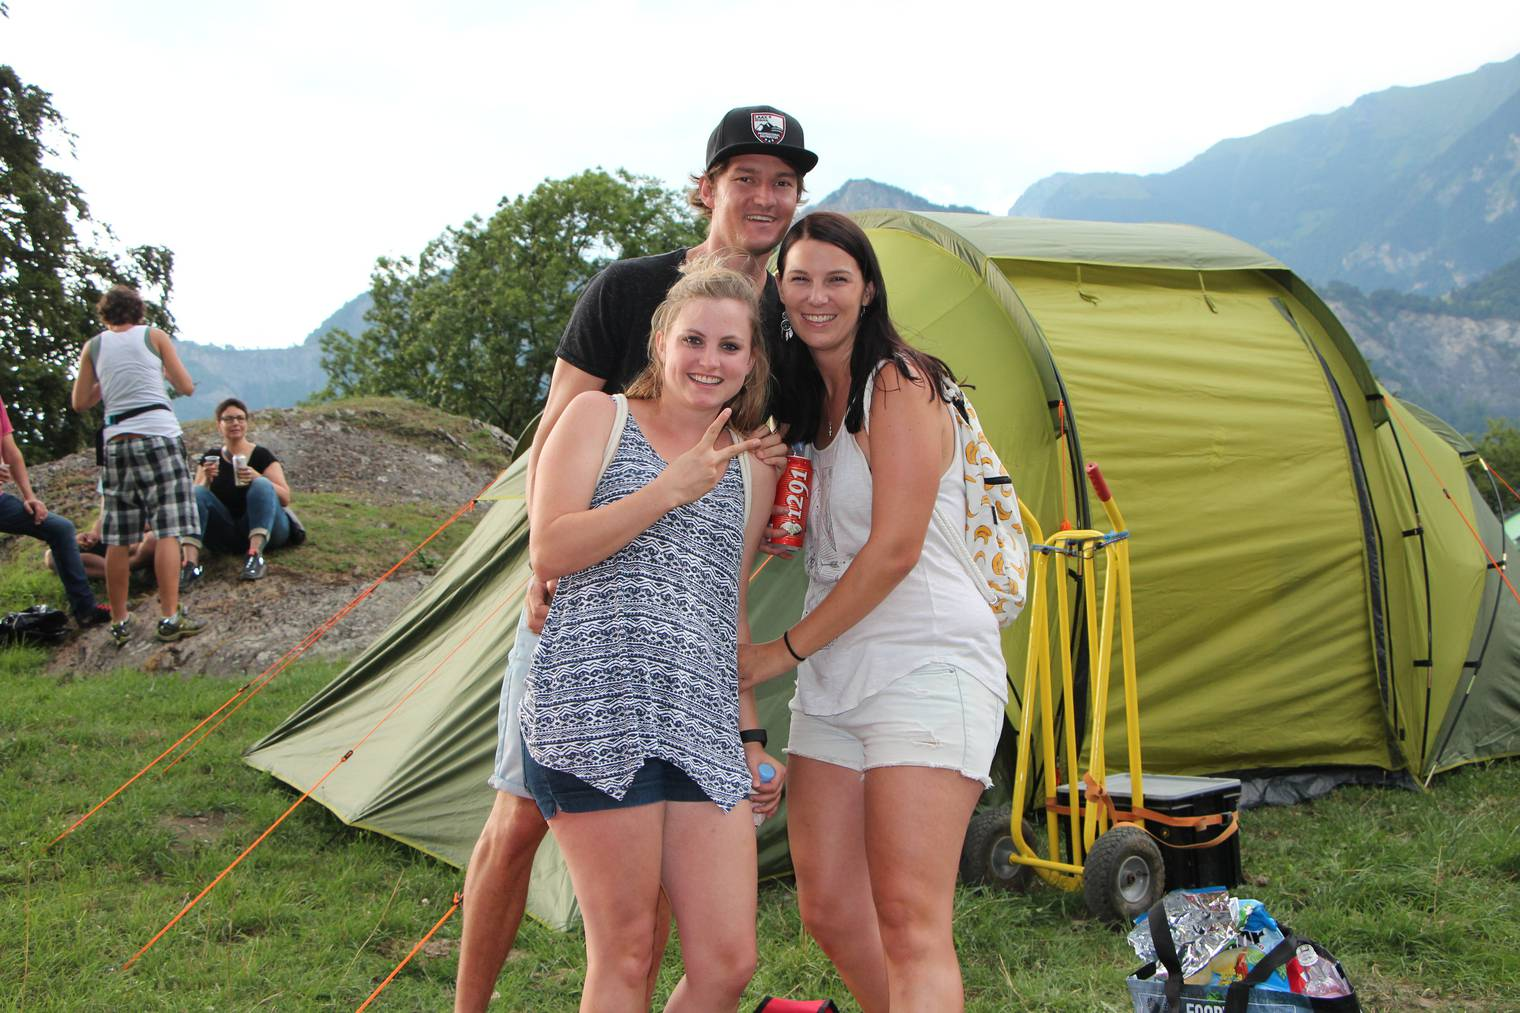 Joelle (links) und Carmen trinken nur Holunderblütensirup (Bild: Lara Abderhalden)